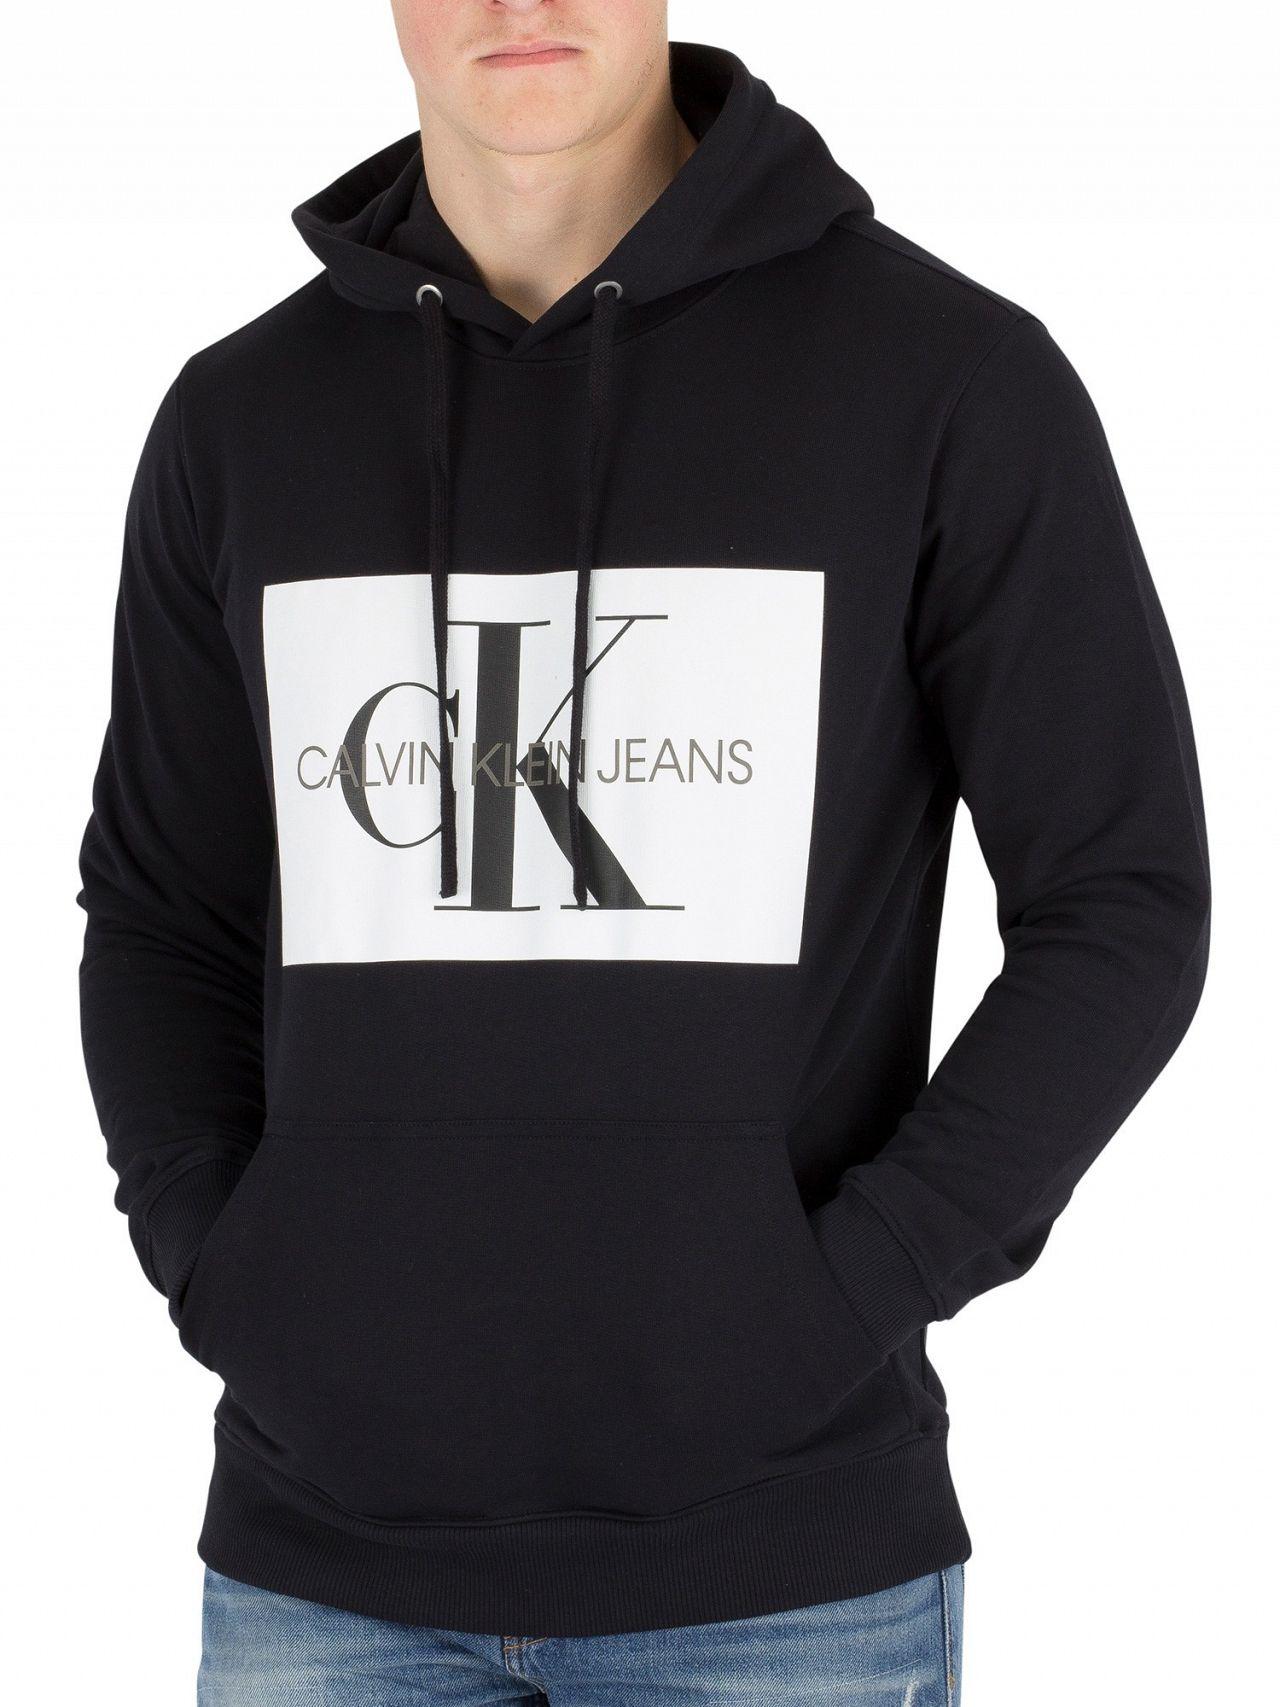 c9b9ab5edc4f Calvin Klein Jeans Black Monogram Box Pullover Hoodie